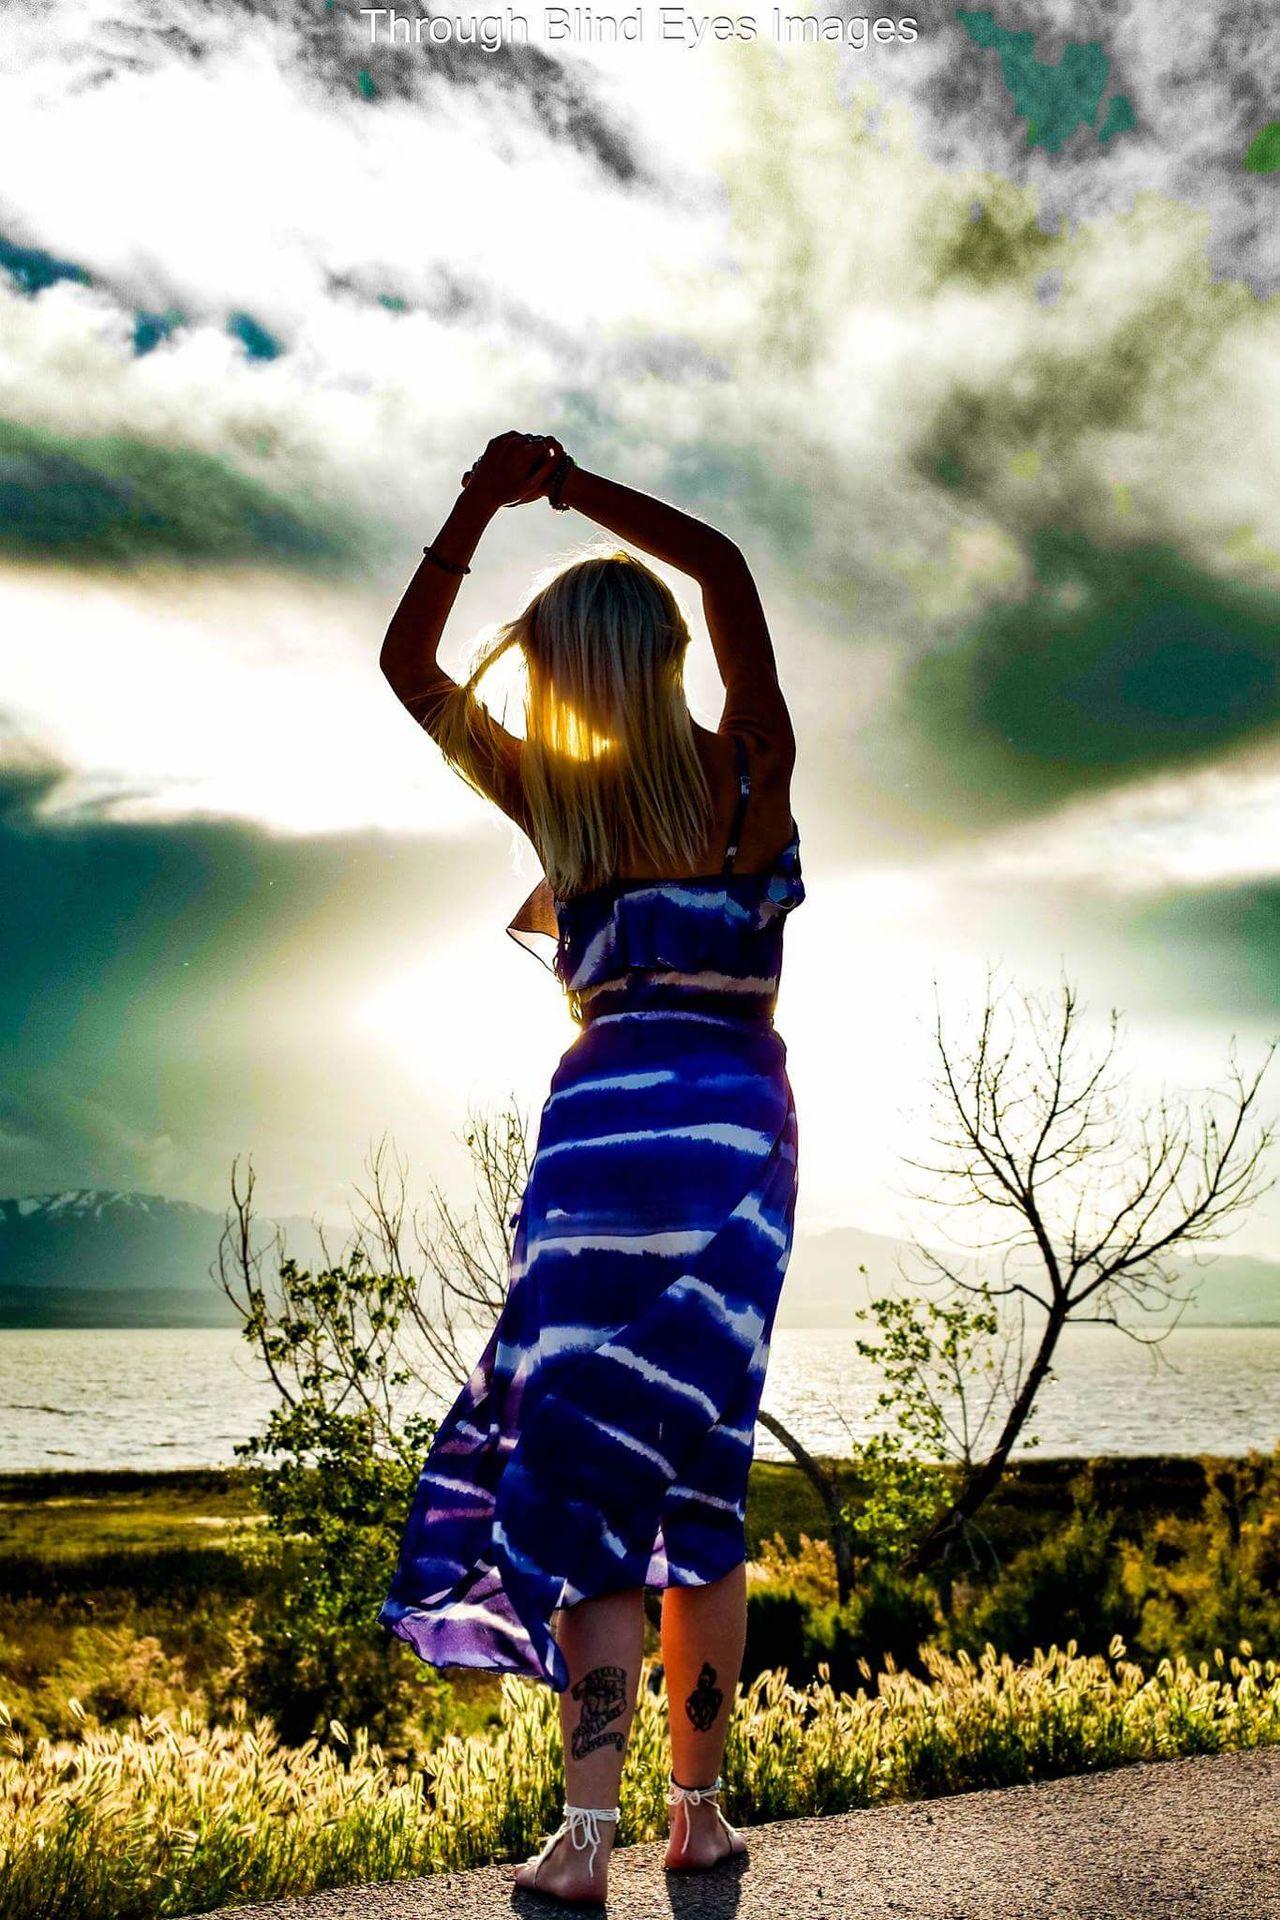 Natural Light Portrait Sunlight And Shade Outdoor Photography Portrait Inspirational Taking Photos Women Of EyeEm EyeEm Gallery The Portraitist - 2016 EyeEm Awards Portrait Of A Woman EyeEm Best Shots Portraits Of EyeEm Modeling Shoot Check This Out Eyeem Market Light And Shadow Sunset Silhouettes EyeEm Best Shots - Sunsets + Sunrise